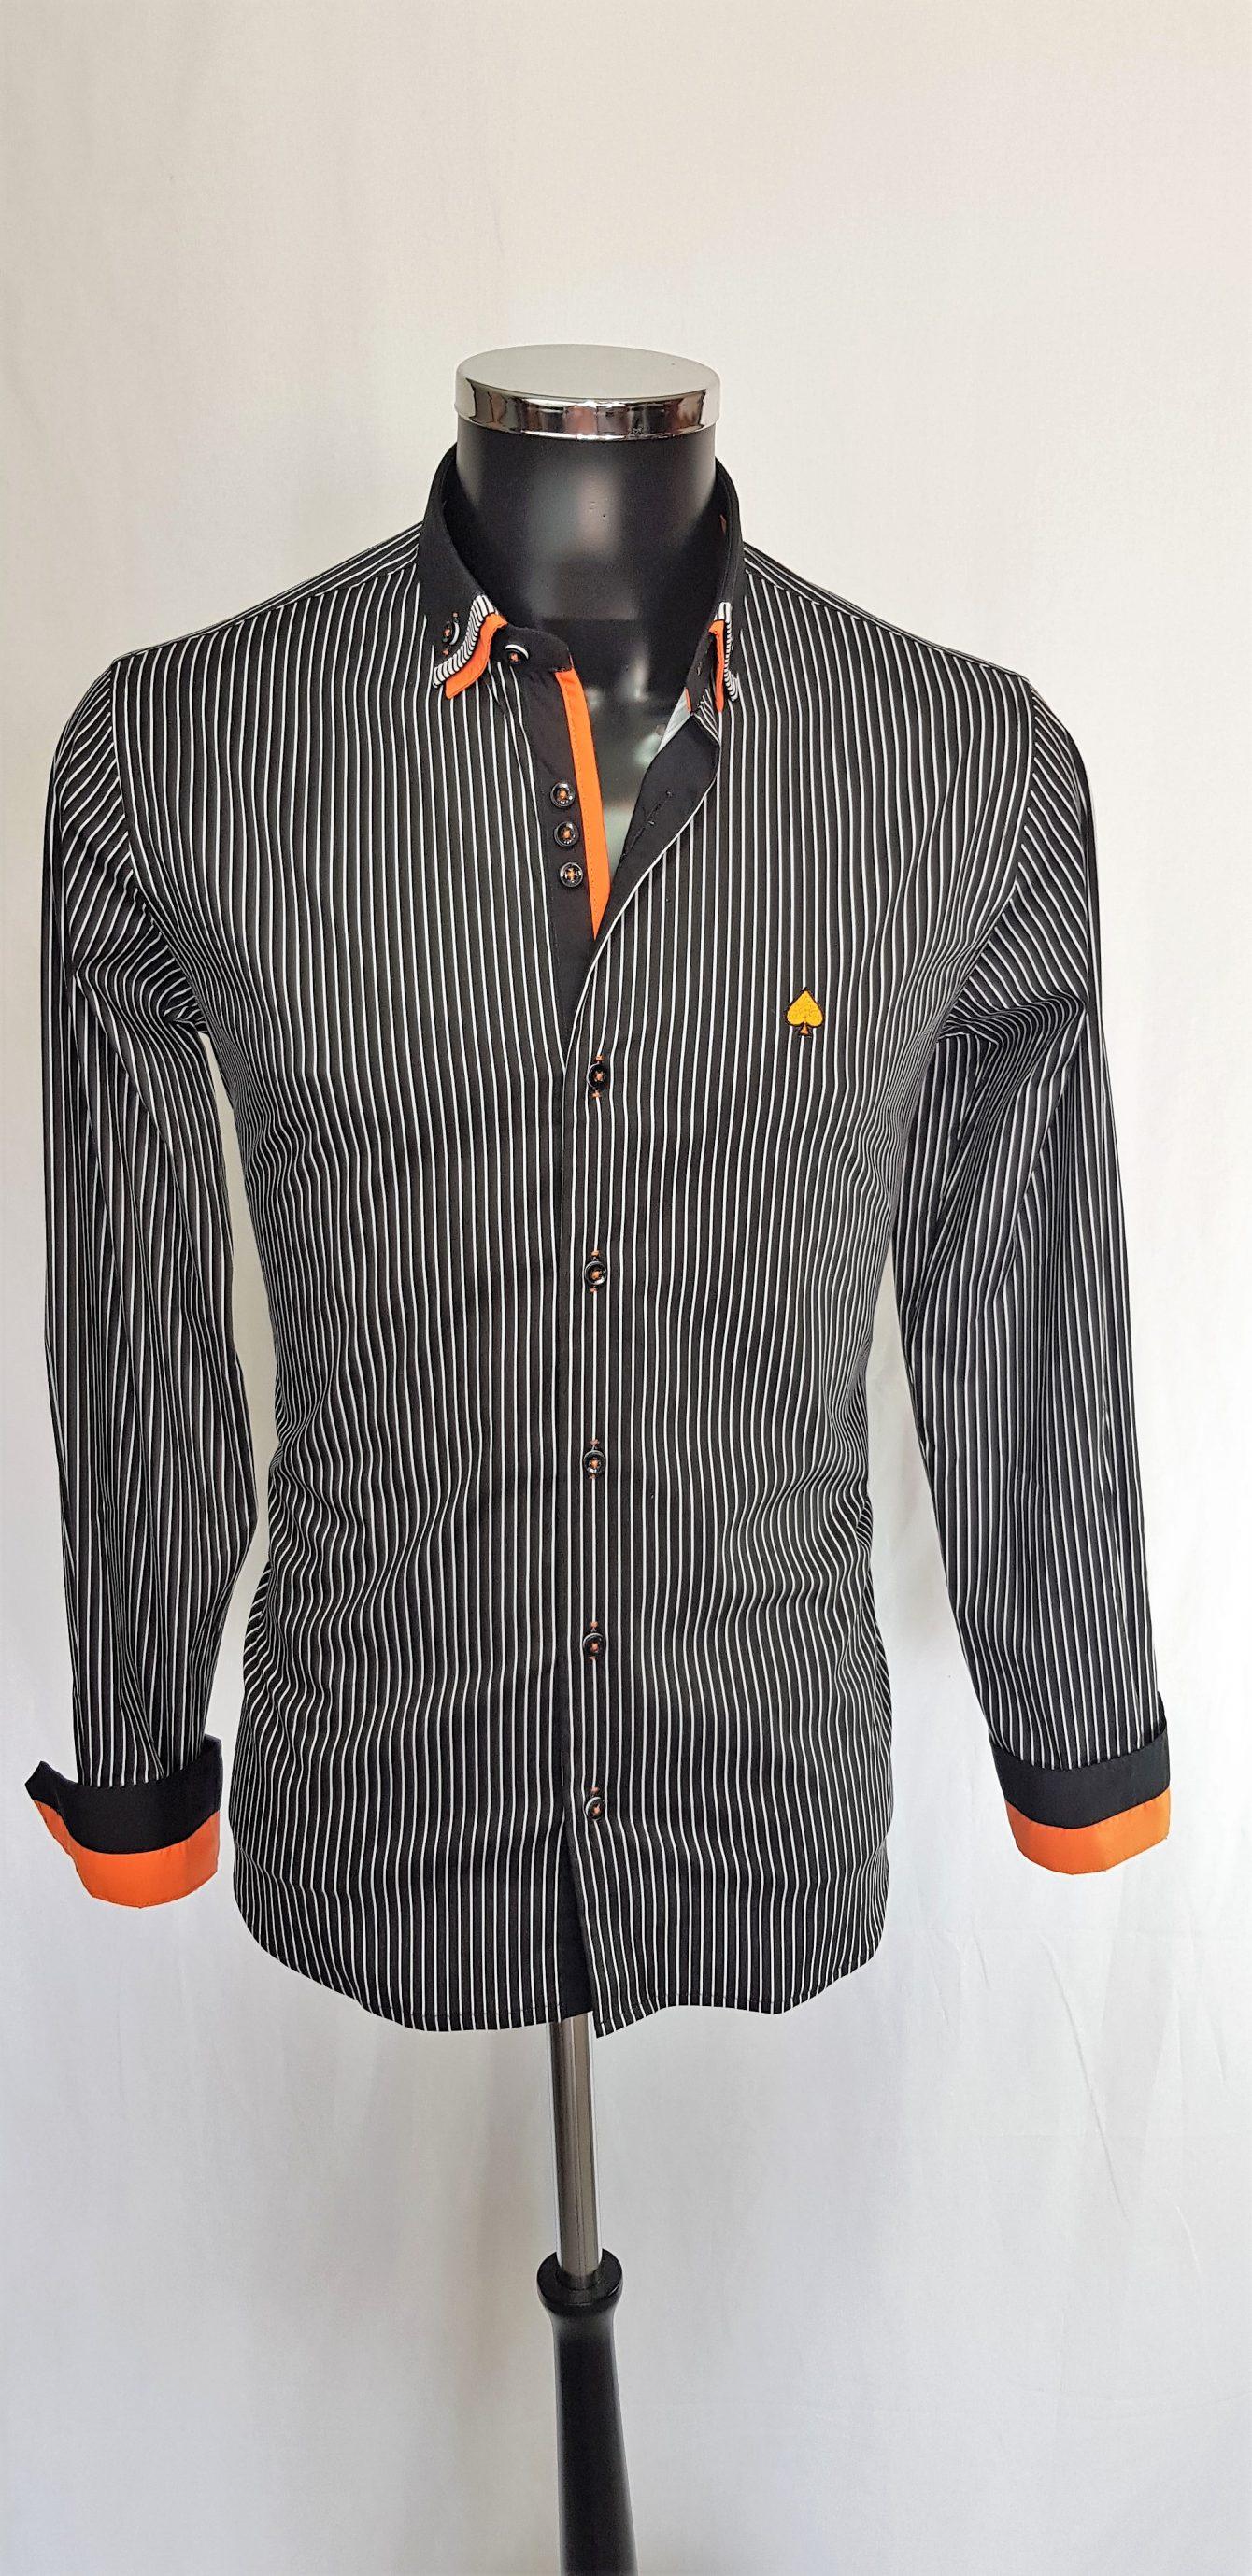 brand new 878fe 0ea52 Shirt camicie uomo Tendenze Italy Ref. C-CU8-022